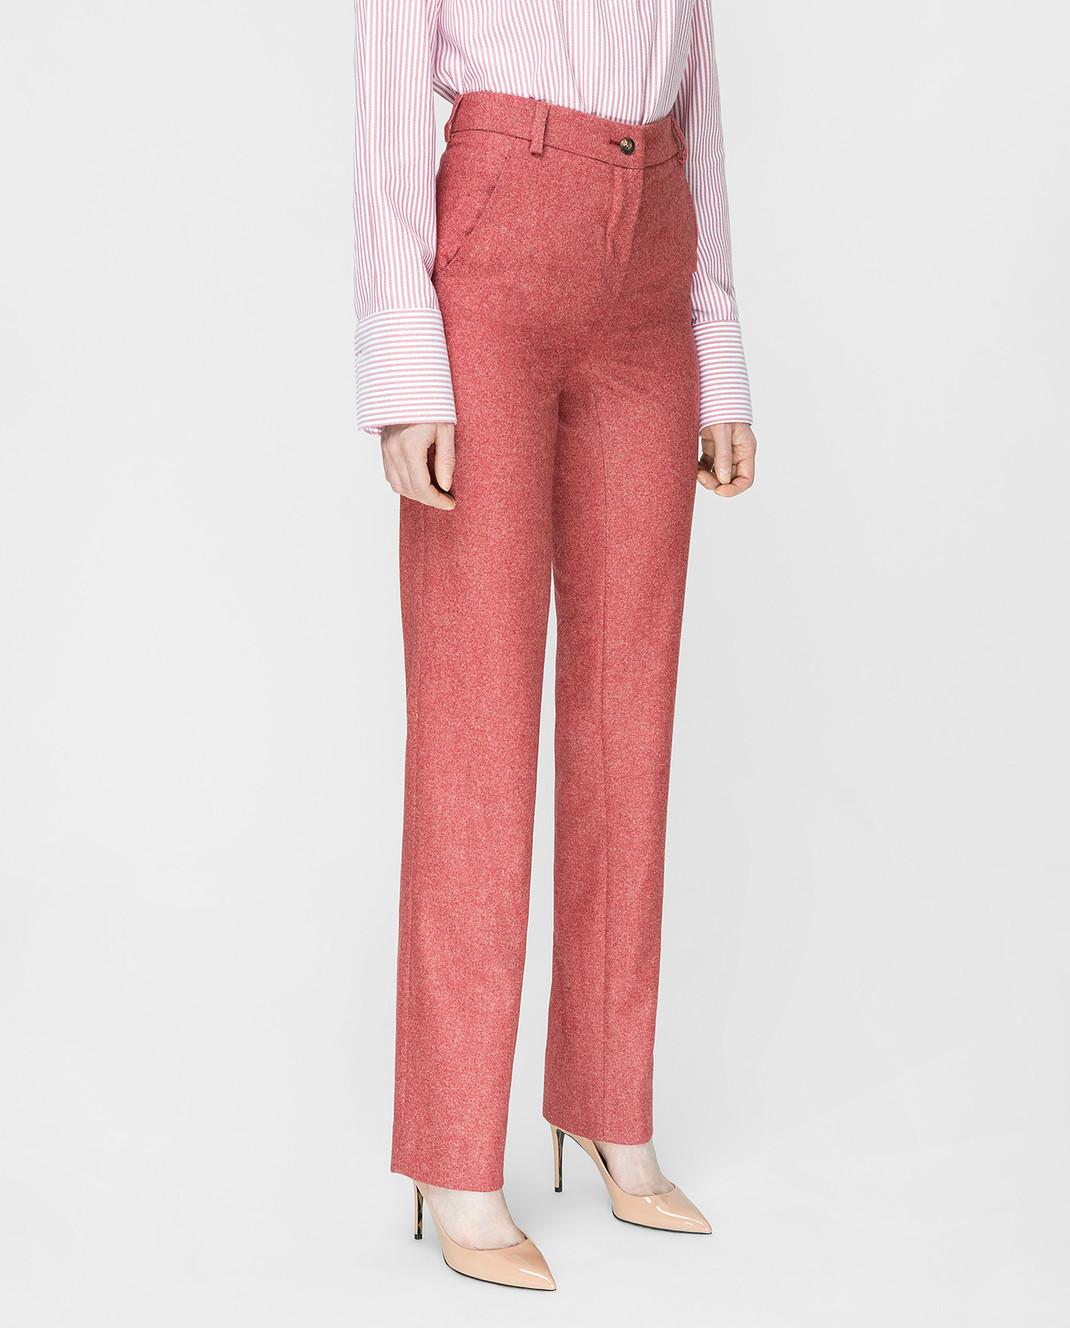 Stile Latino Бордовые брюки PDMARIELLA2EWU01 изображение 3